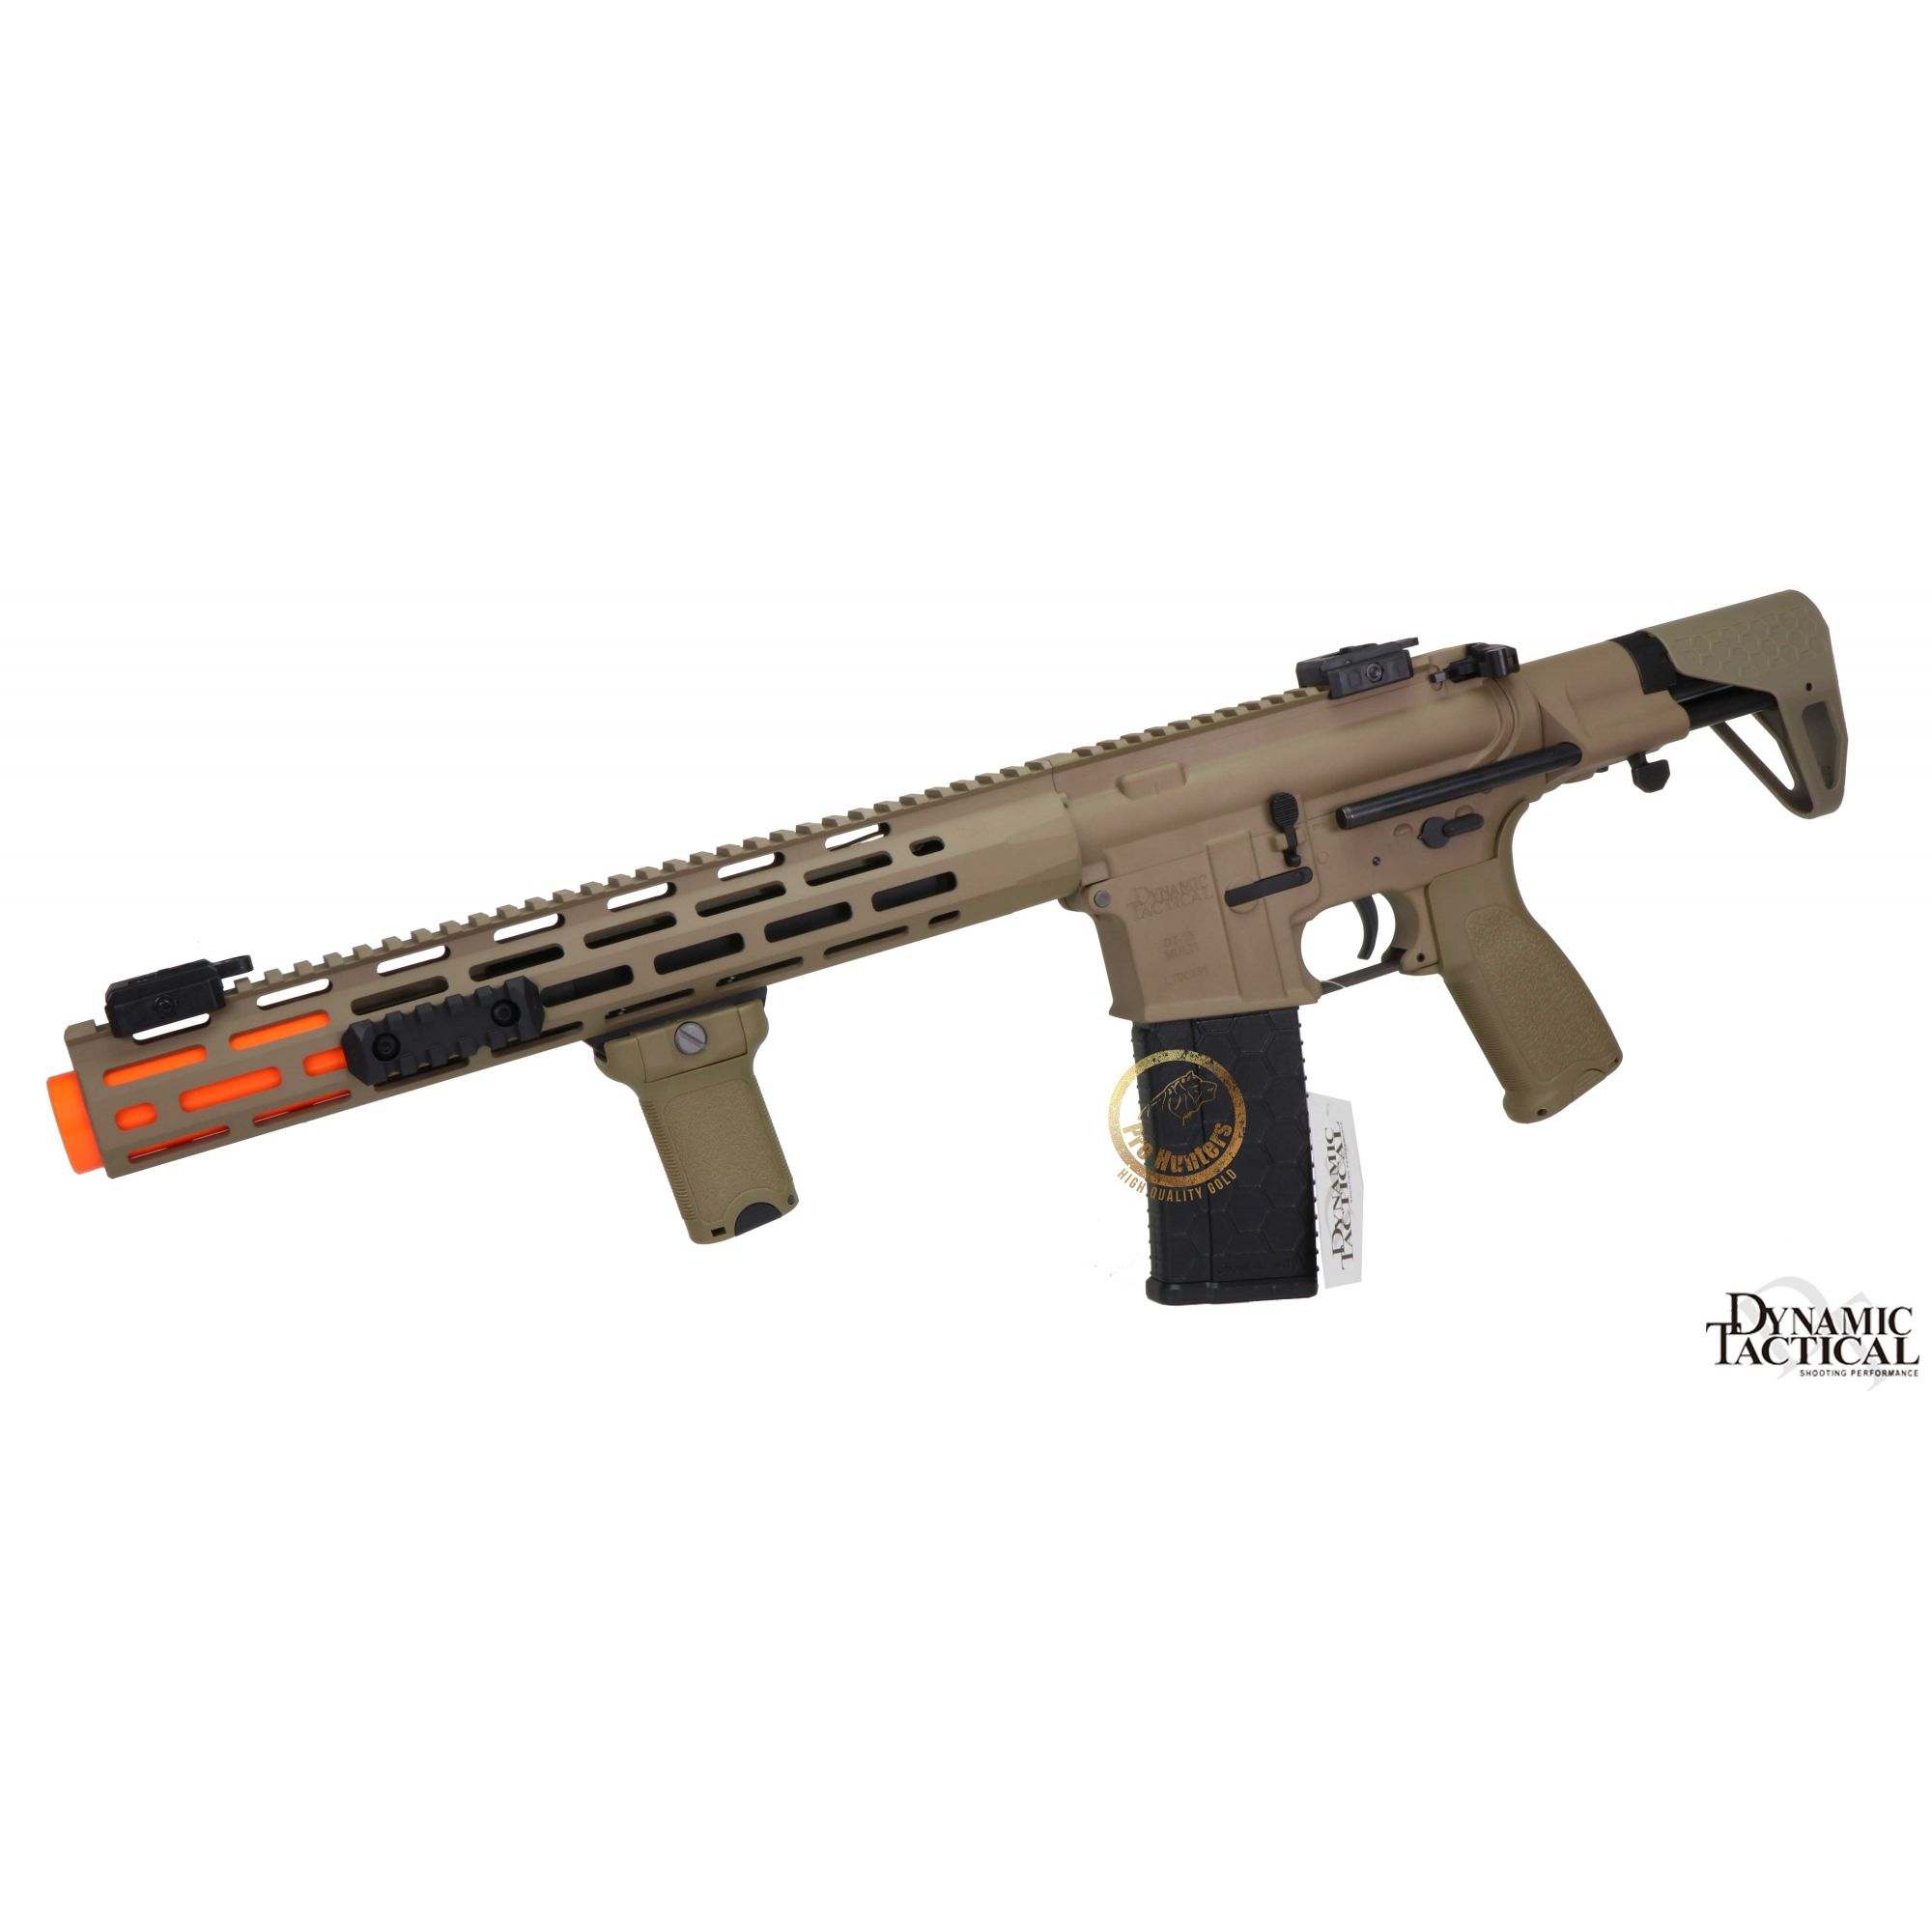 Rifle Airsoft Dytac EVO Standard M4 SBR Type A - Black